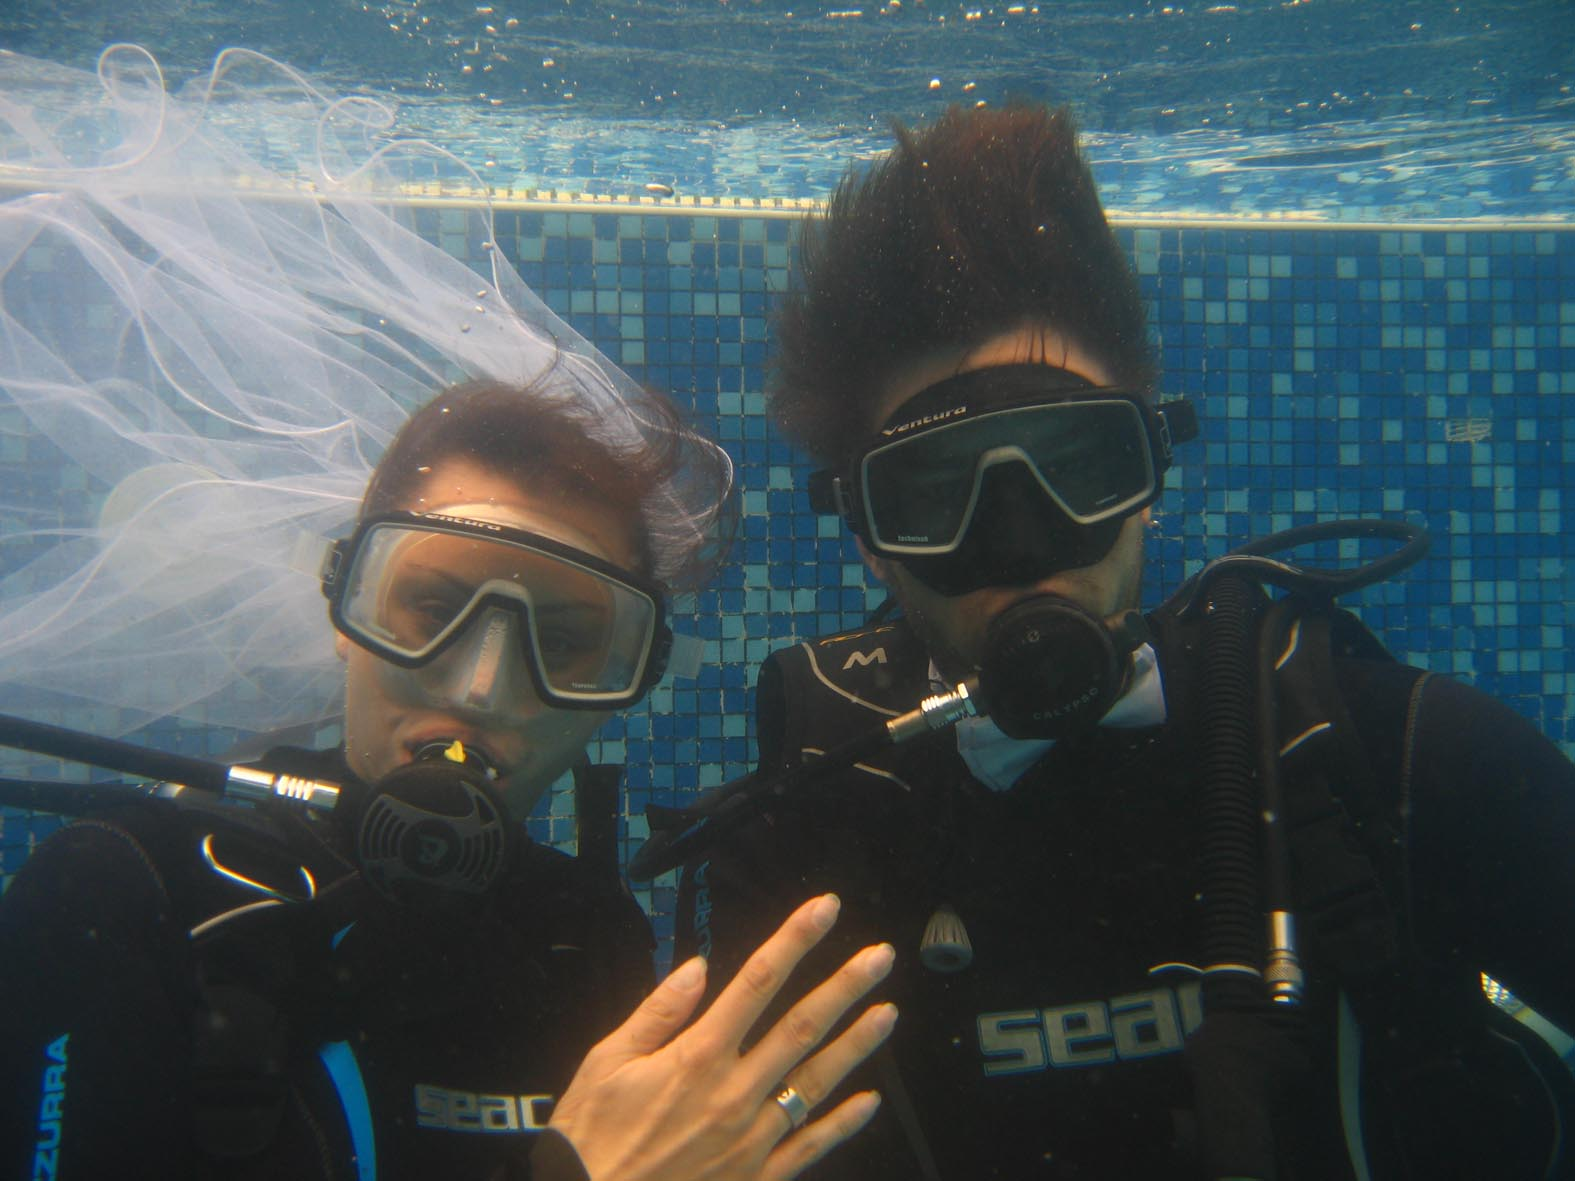 Български младоженци вдигнаха сватба под вода